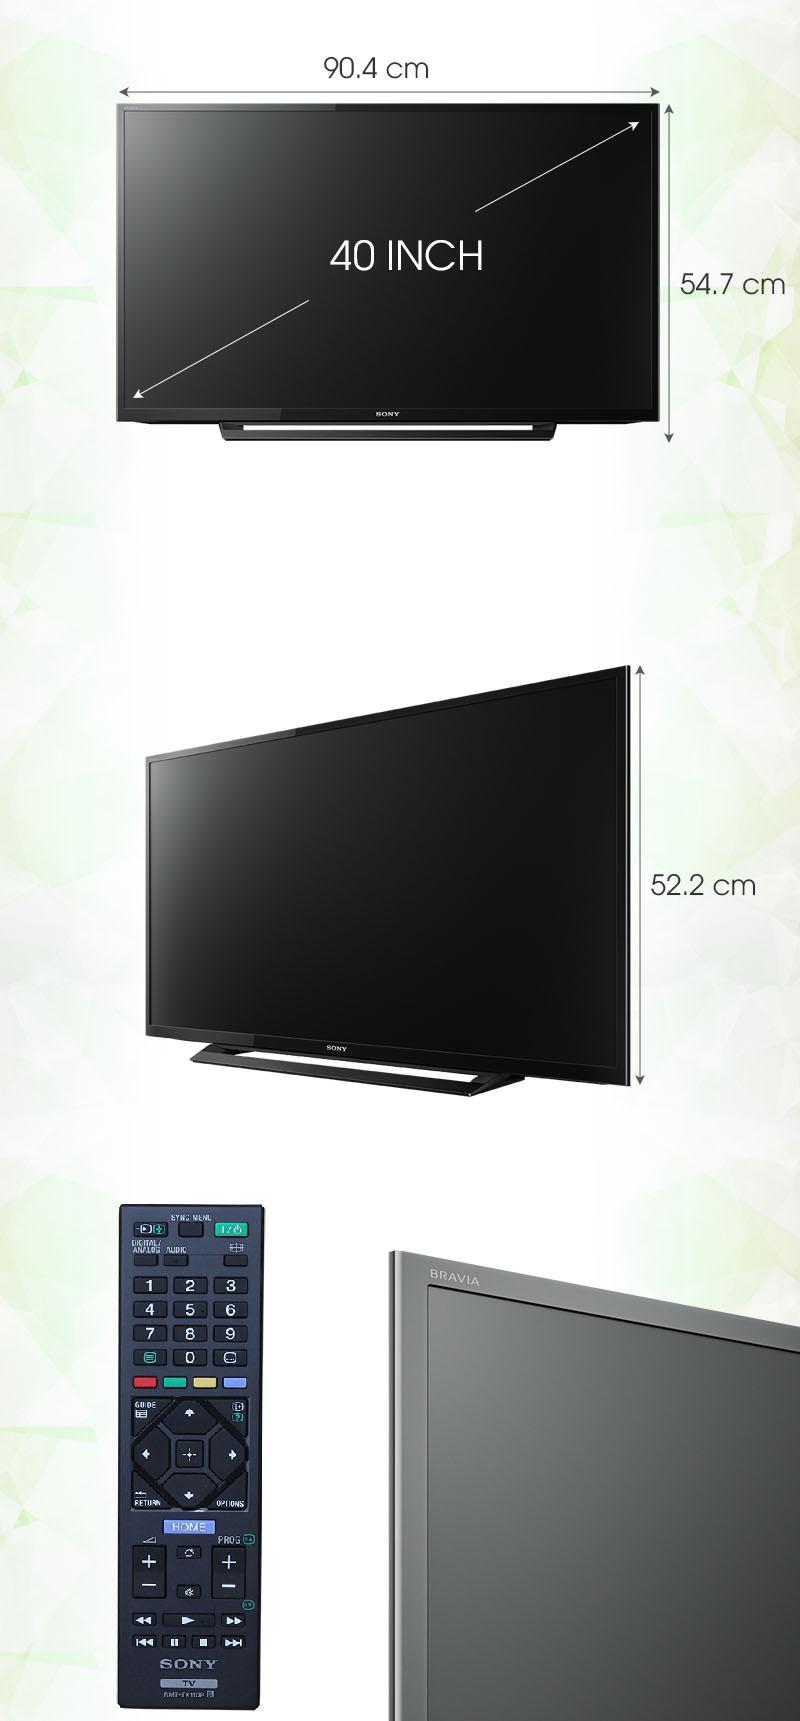 Tivi Sony 40 inch KDL-40R350D - Kích thước tivi